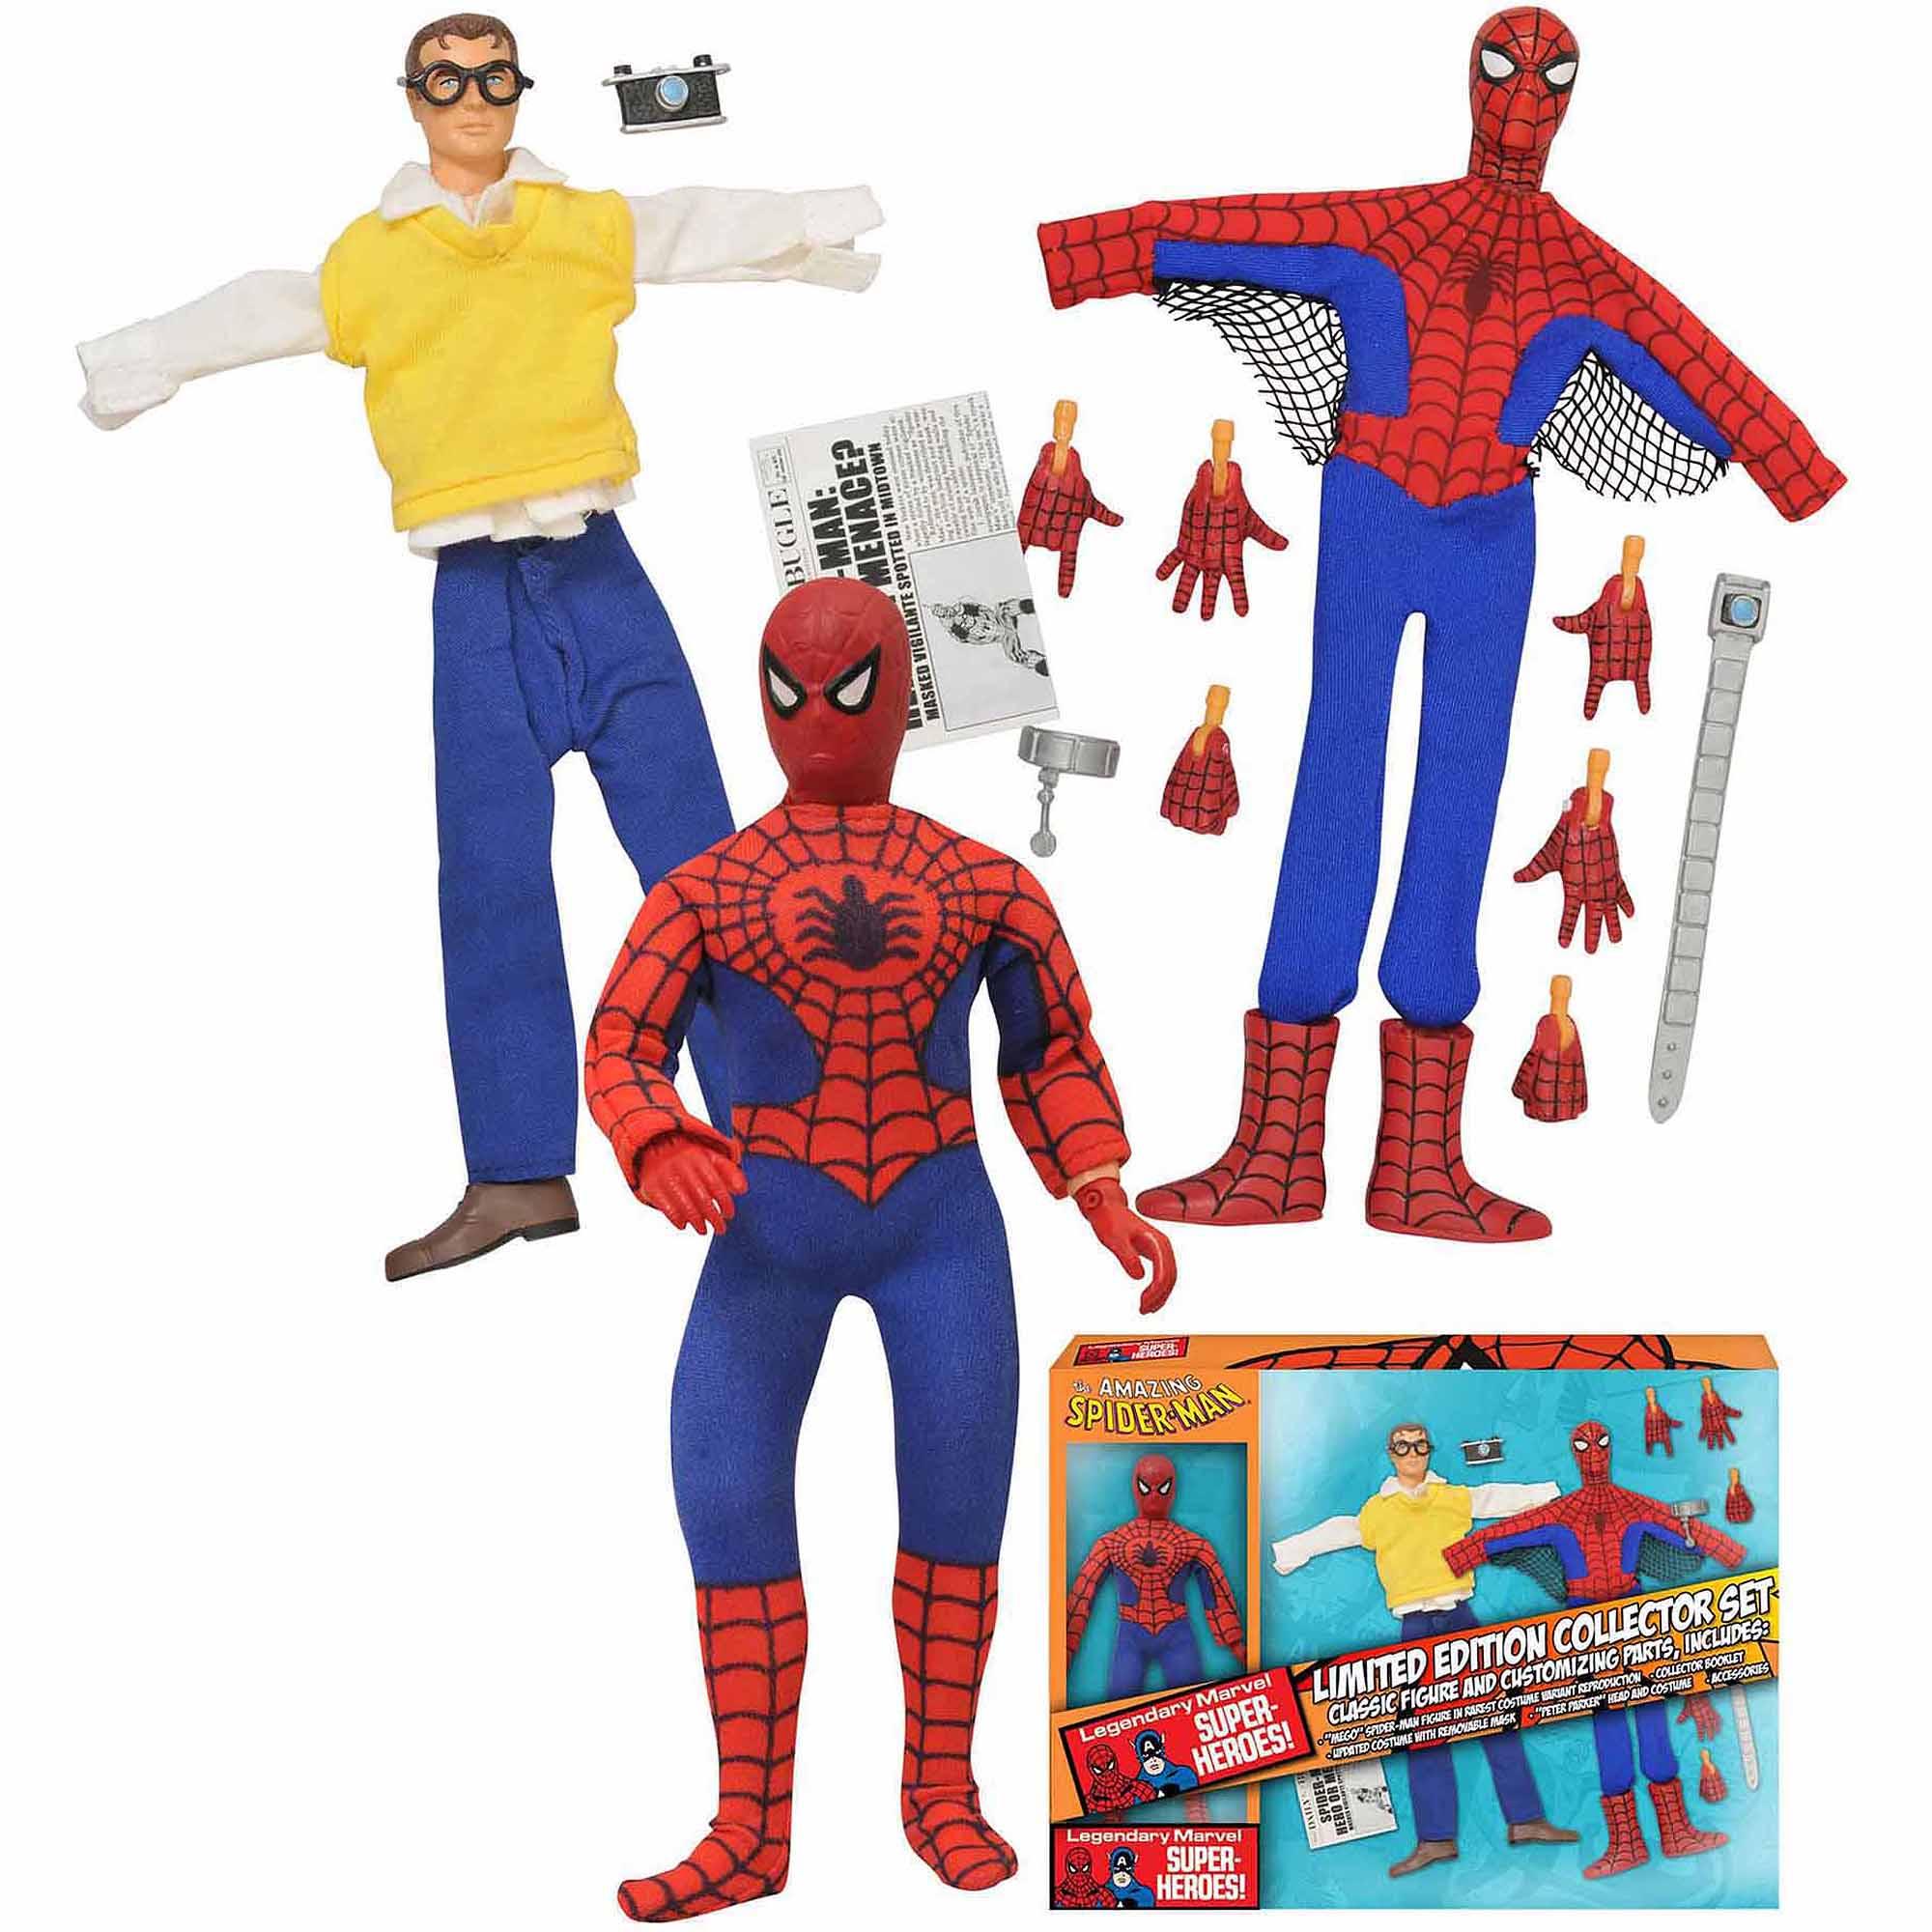 "Diamond Select Toys Marvel Limited Edition Spider-Man 8"" Retro Action Figure Set"